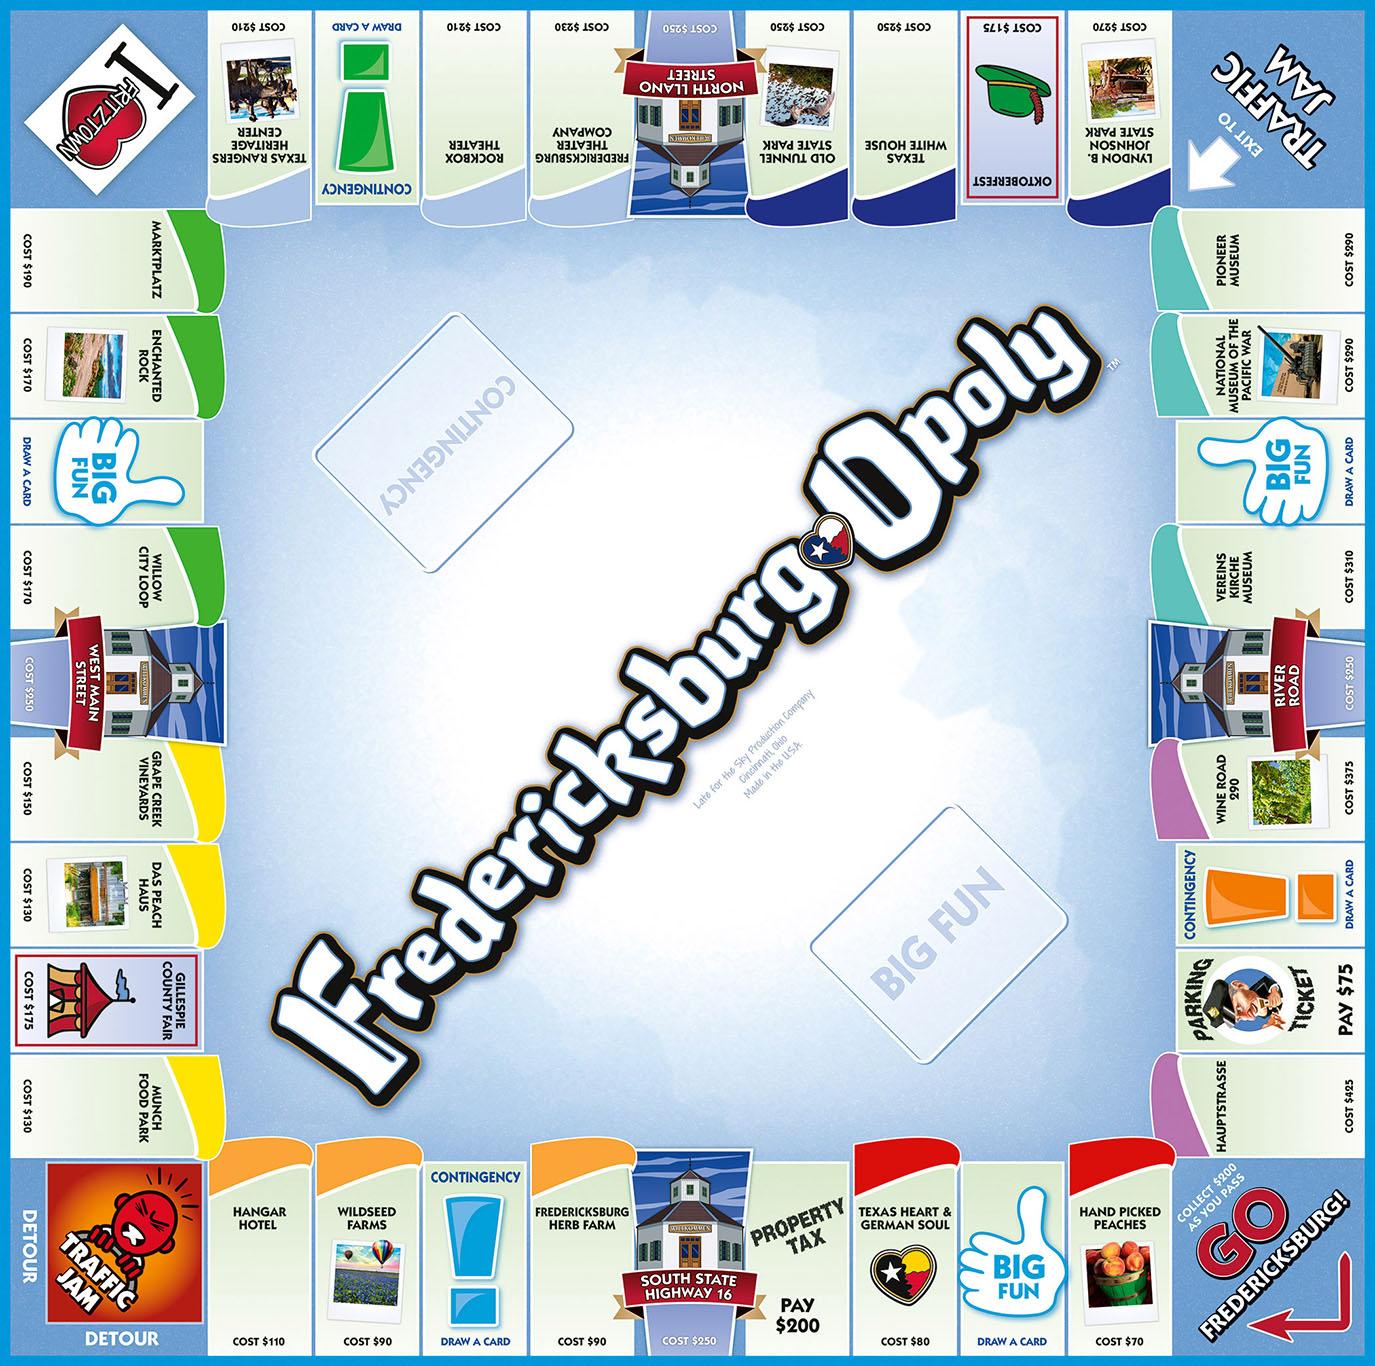 FREDERICKSBURG-OPOLY Board Game